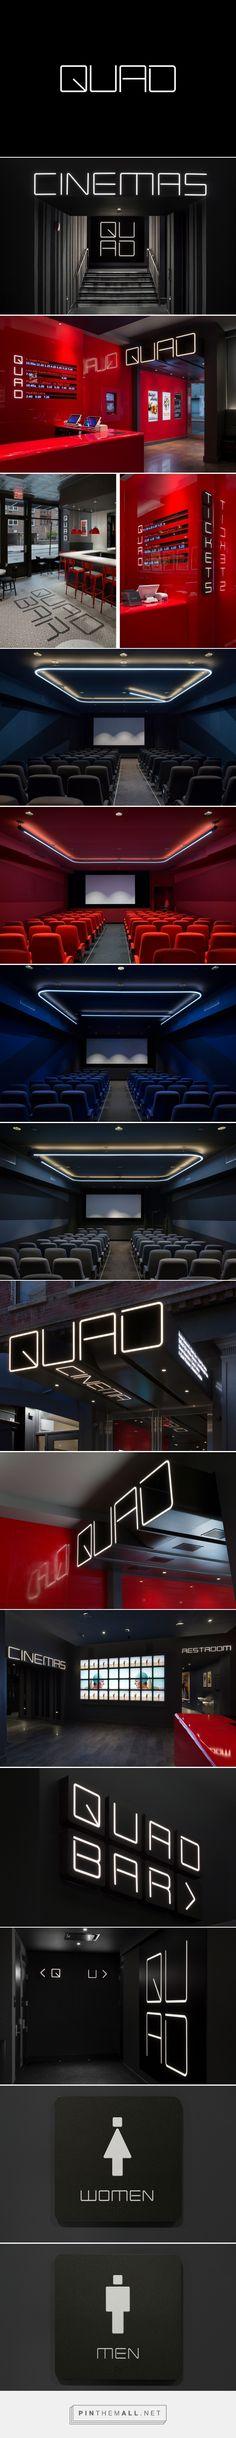 New Logo & Branding for Quad Cinema by Pentagram — BP&O - created via https://pinthemall.net